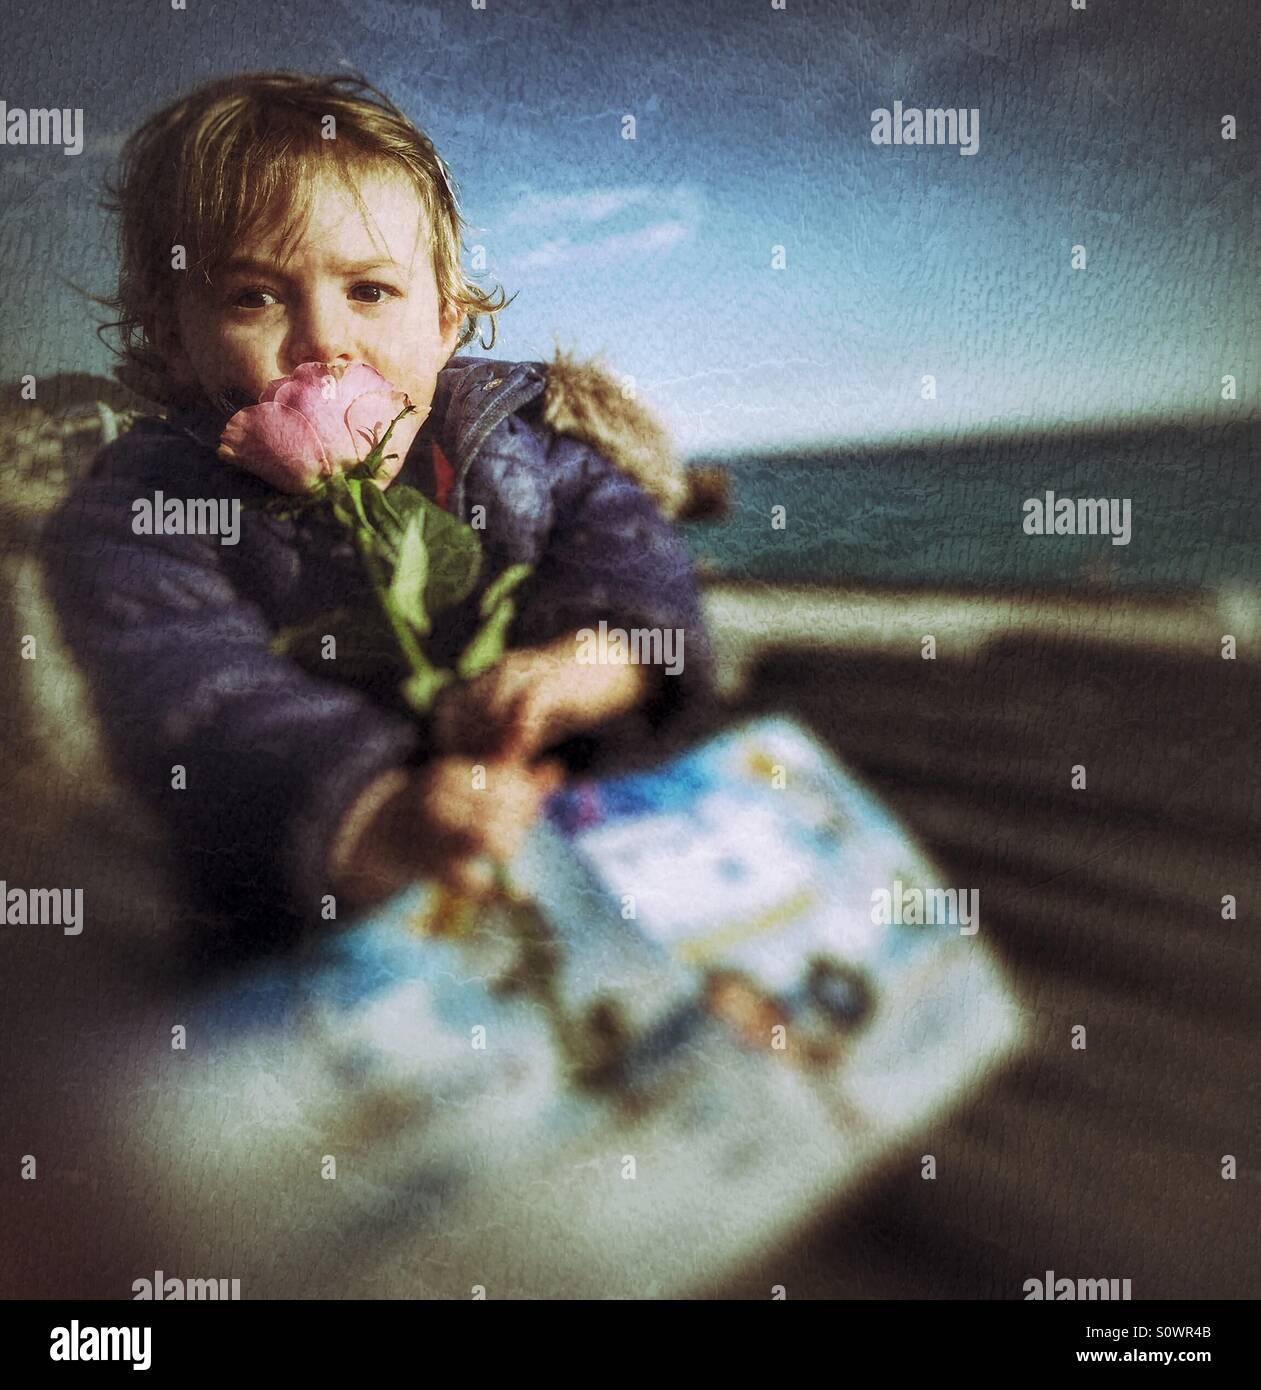 Einjähriges Baby Holding Blume Stockbild